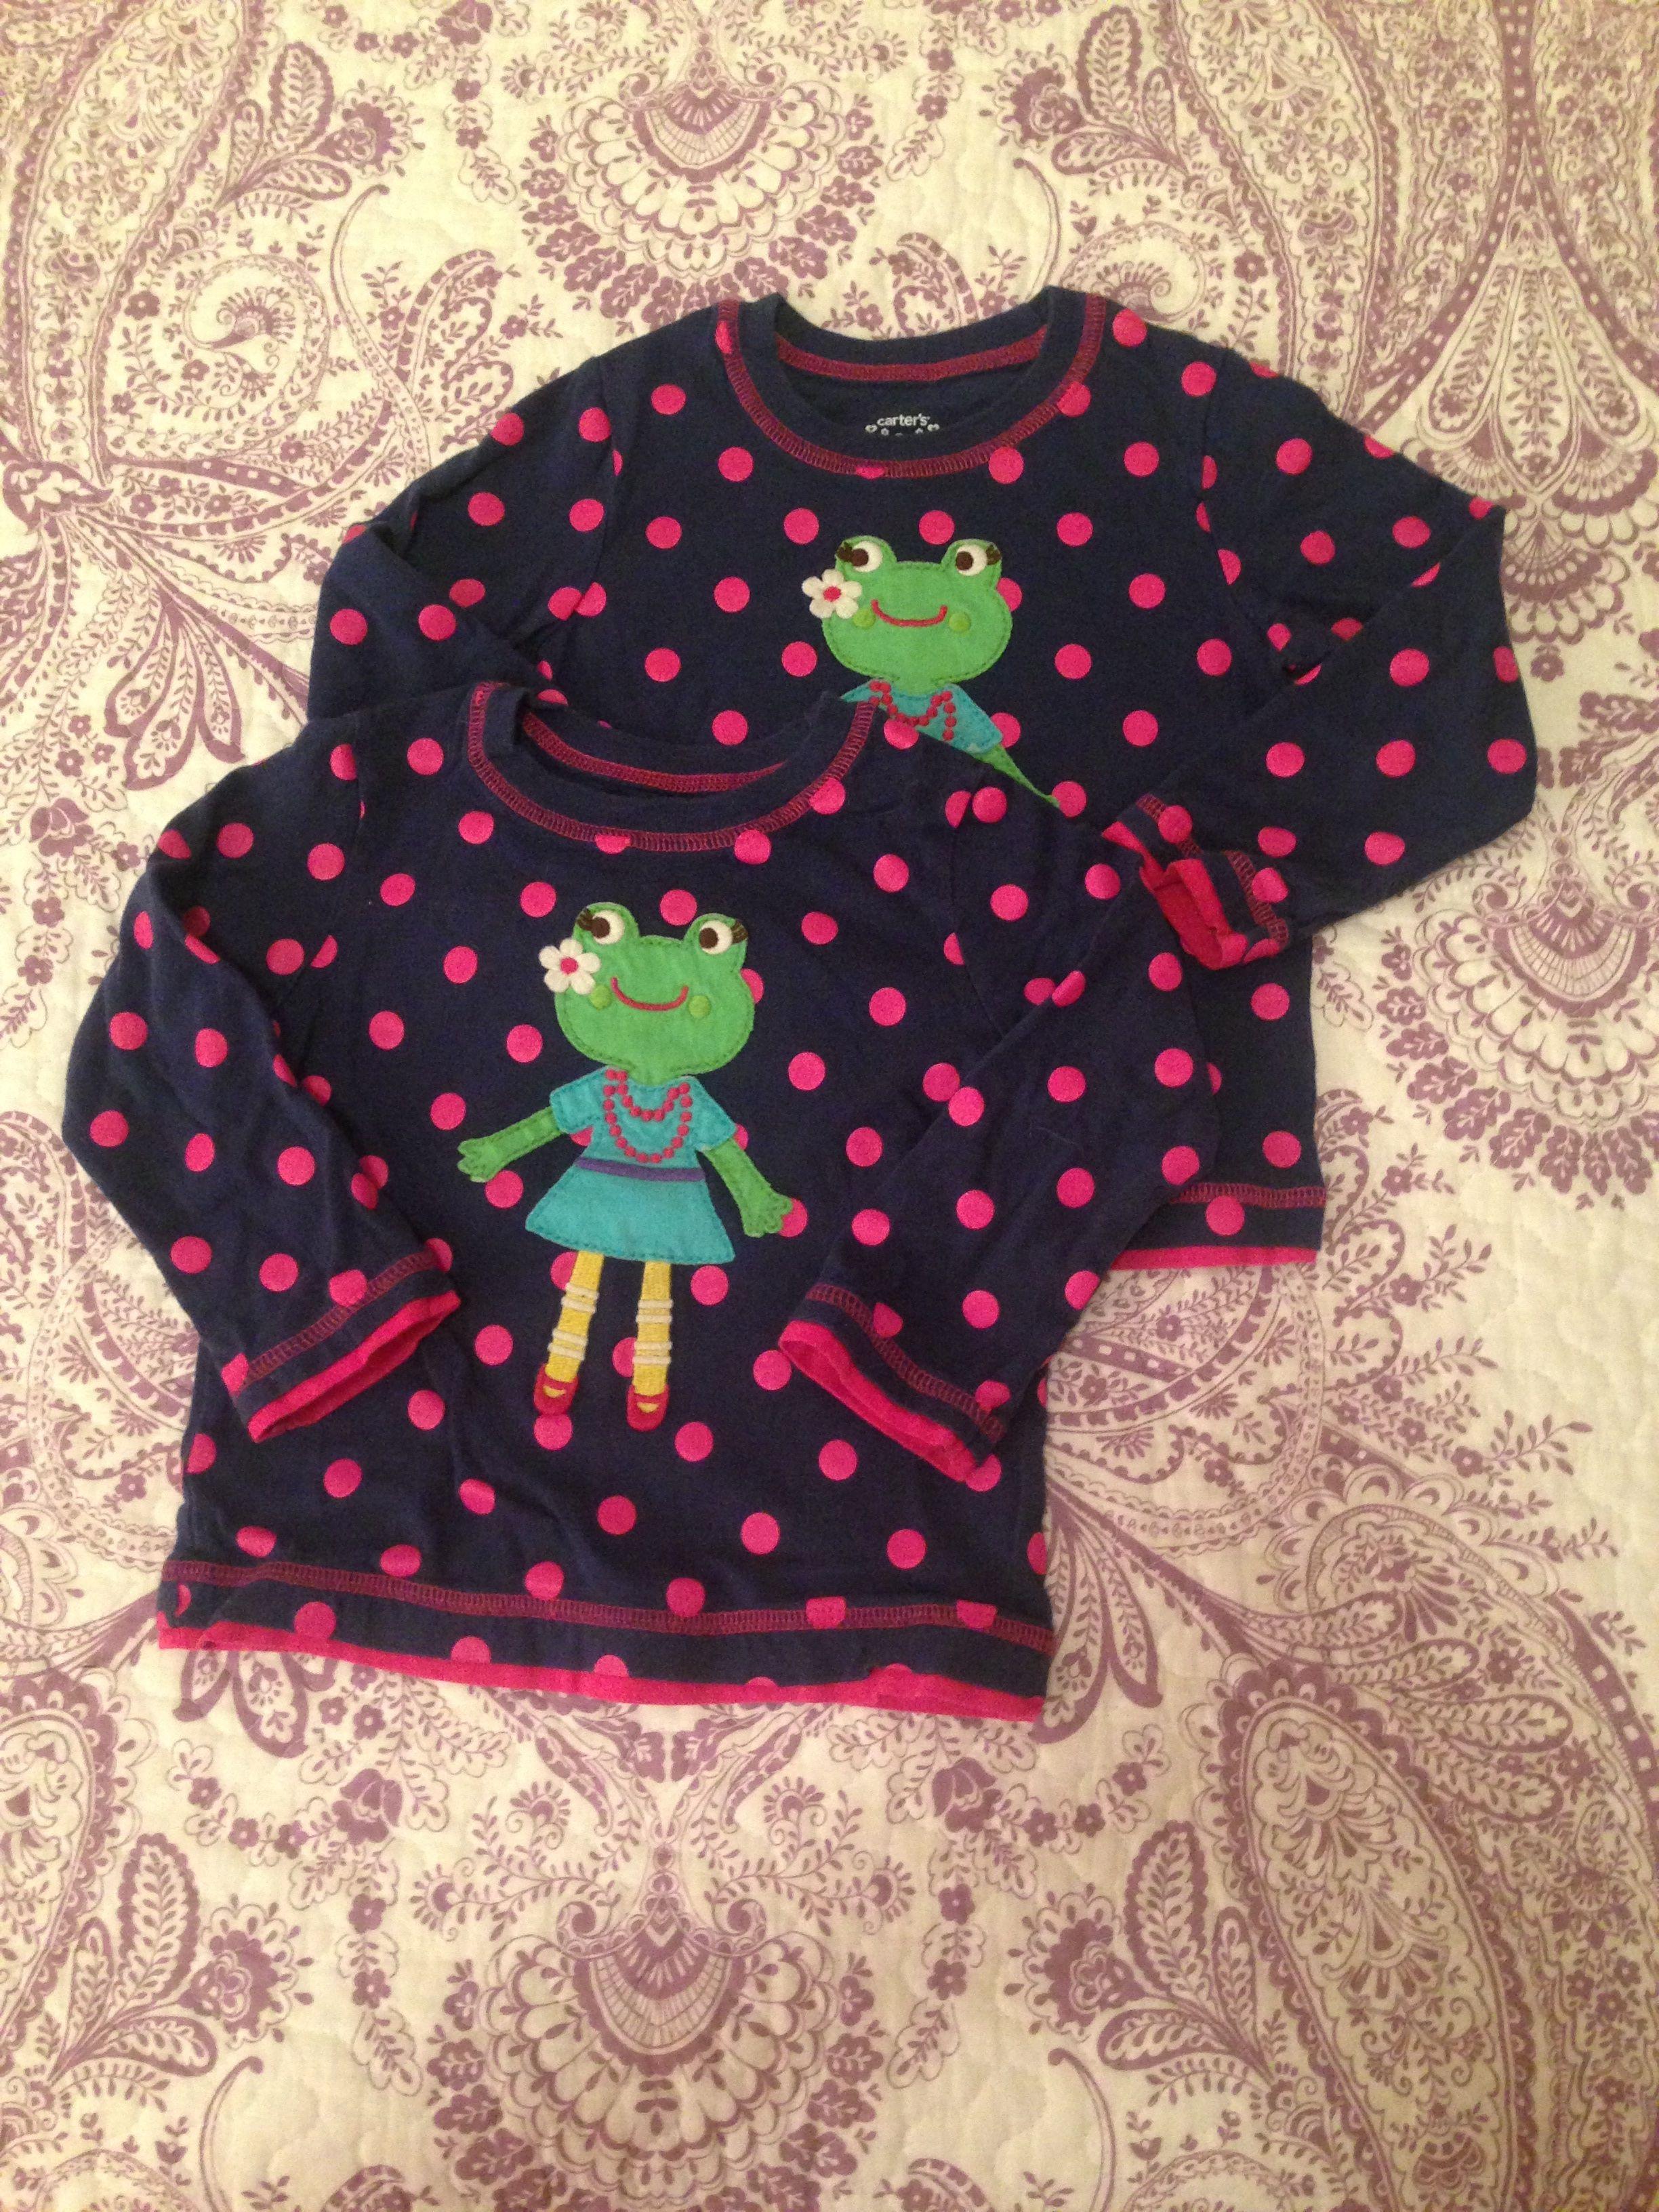 Carterus t long sleeve tee shirt navy with pink polka dots and